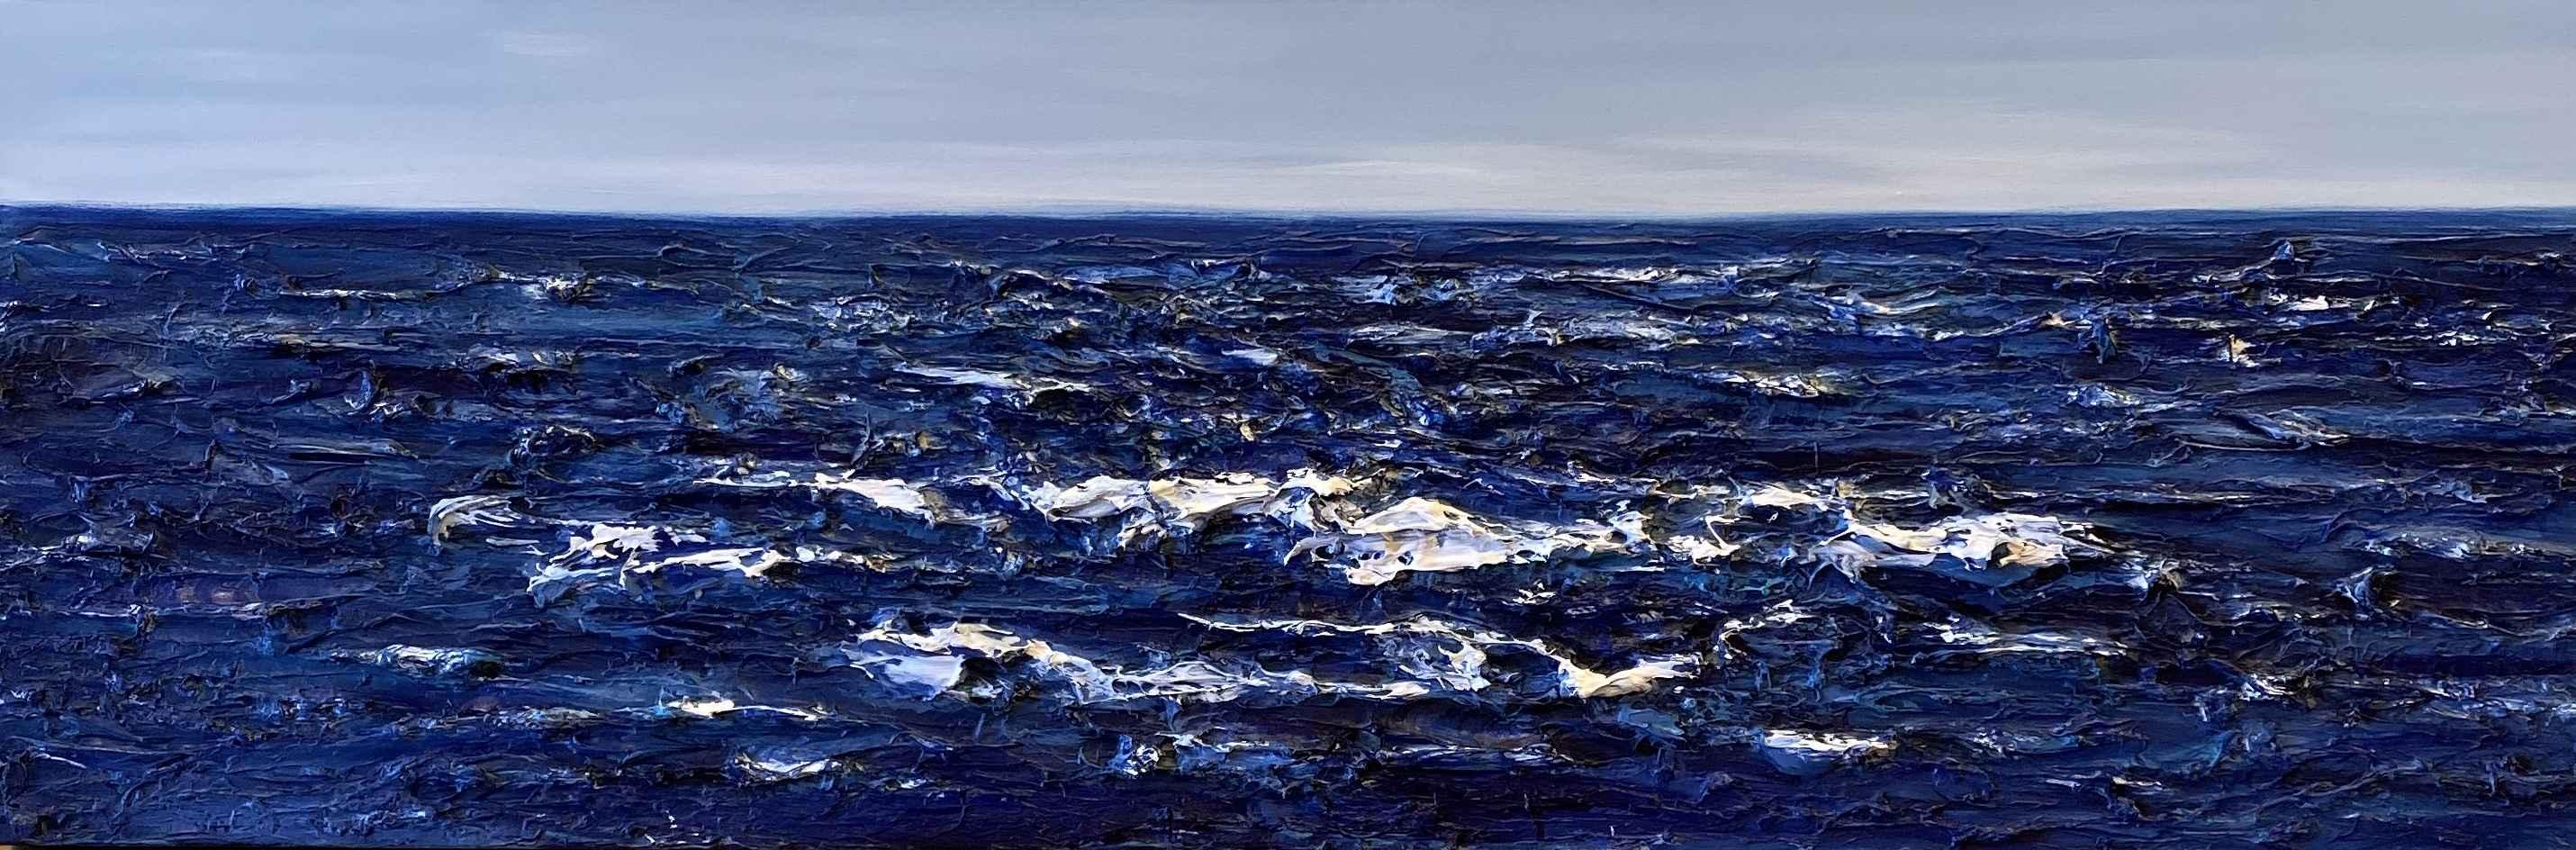 At the Break by  Steve Lyons - Masterpiece Online